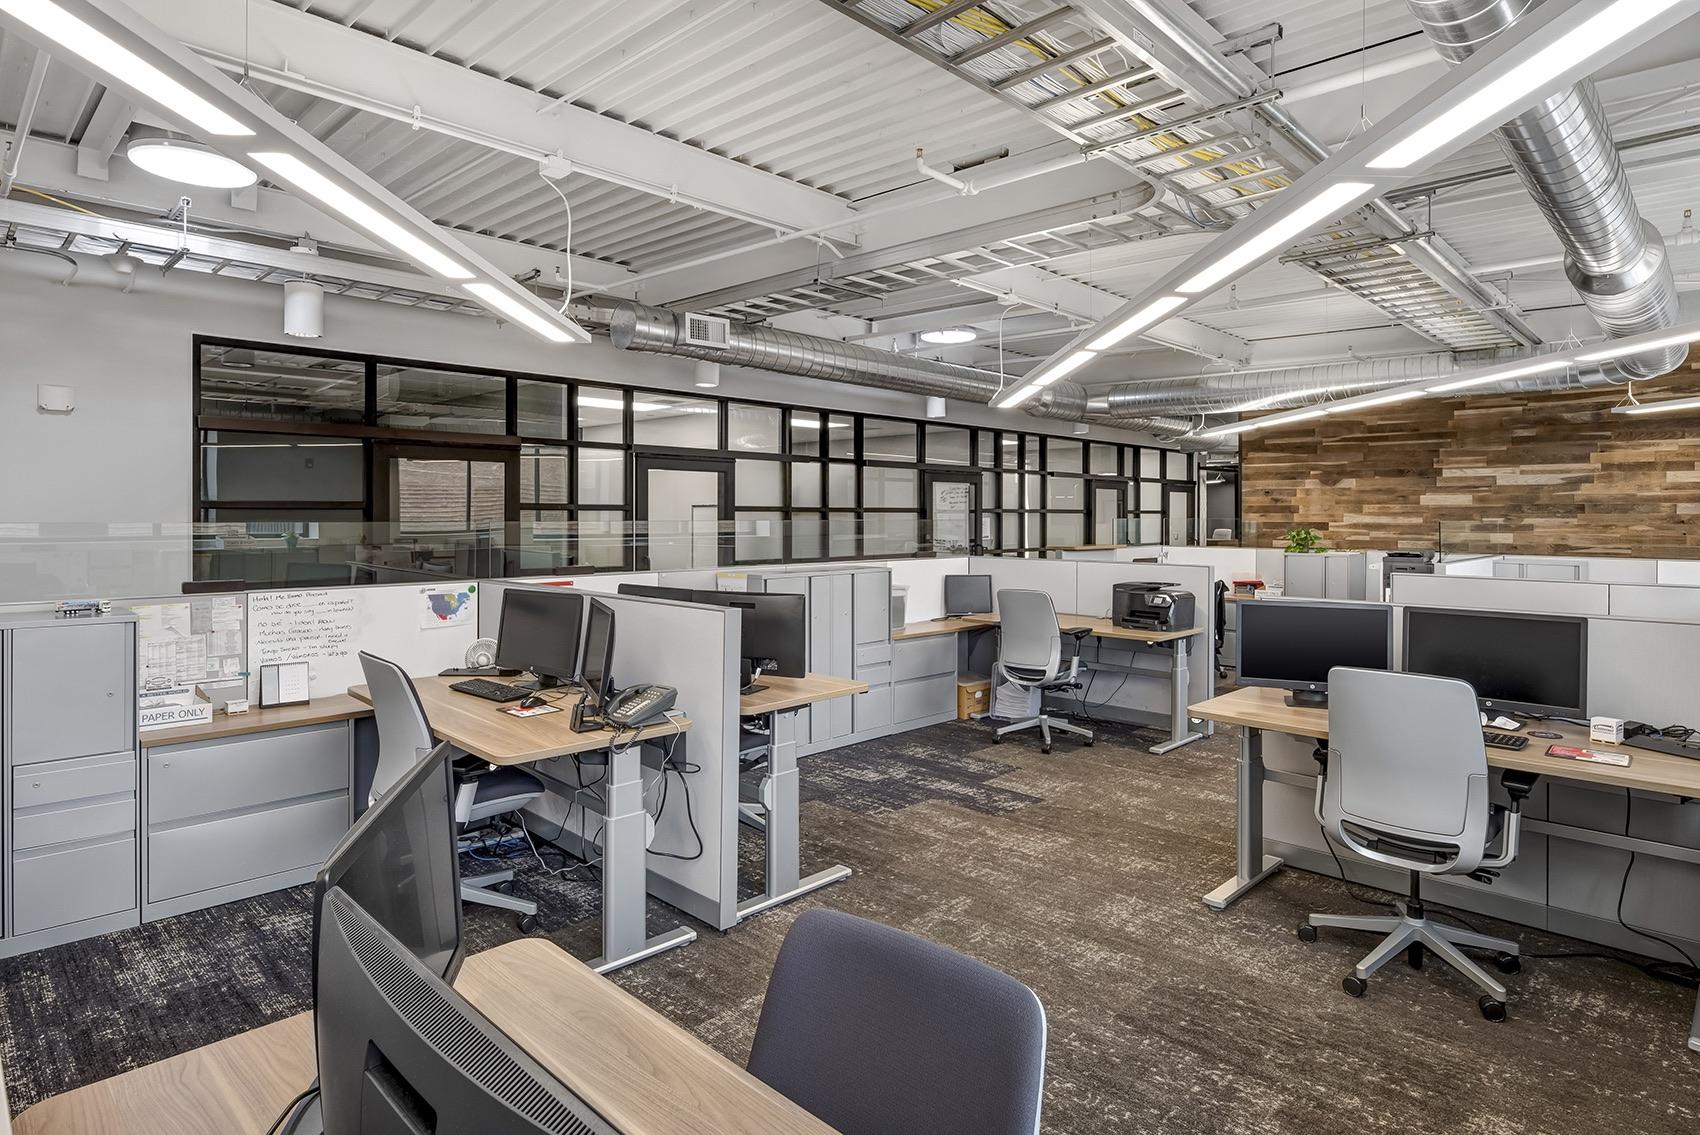 detroit-diesel-office-6